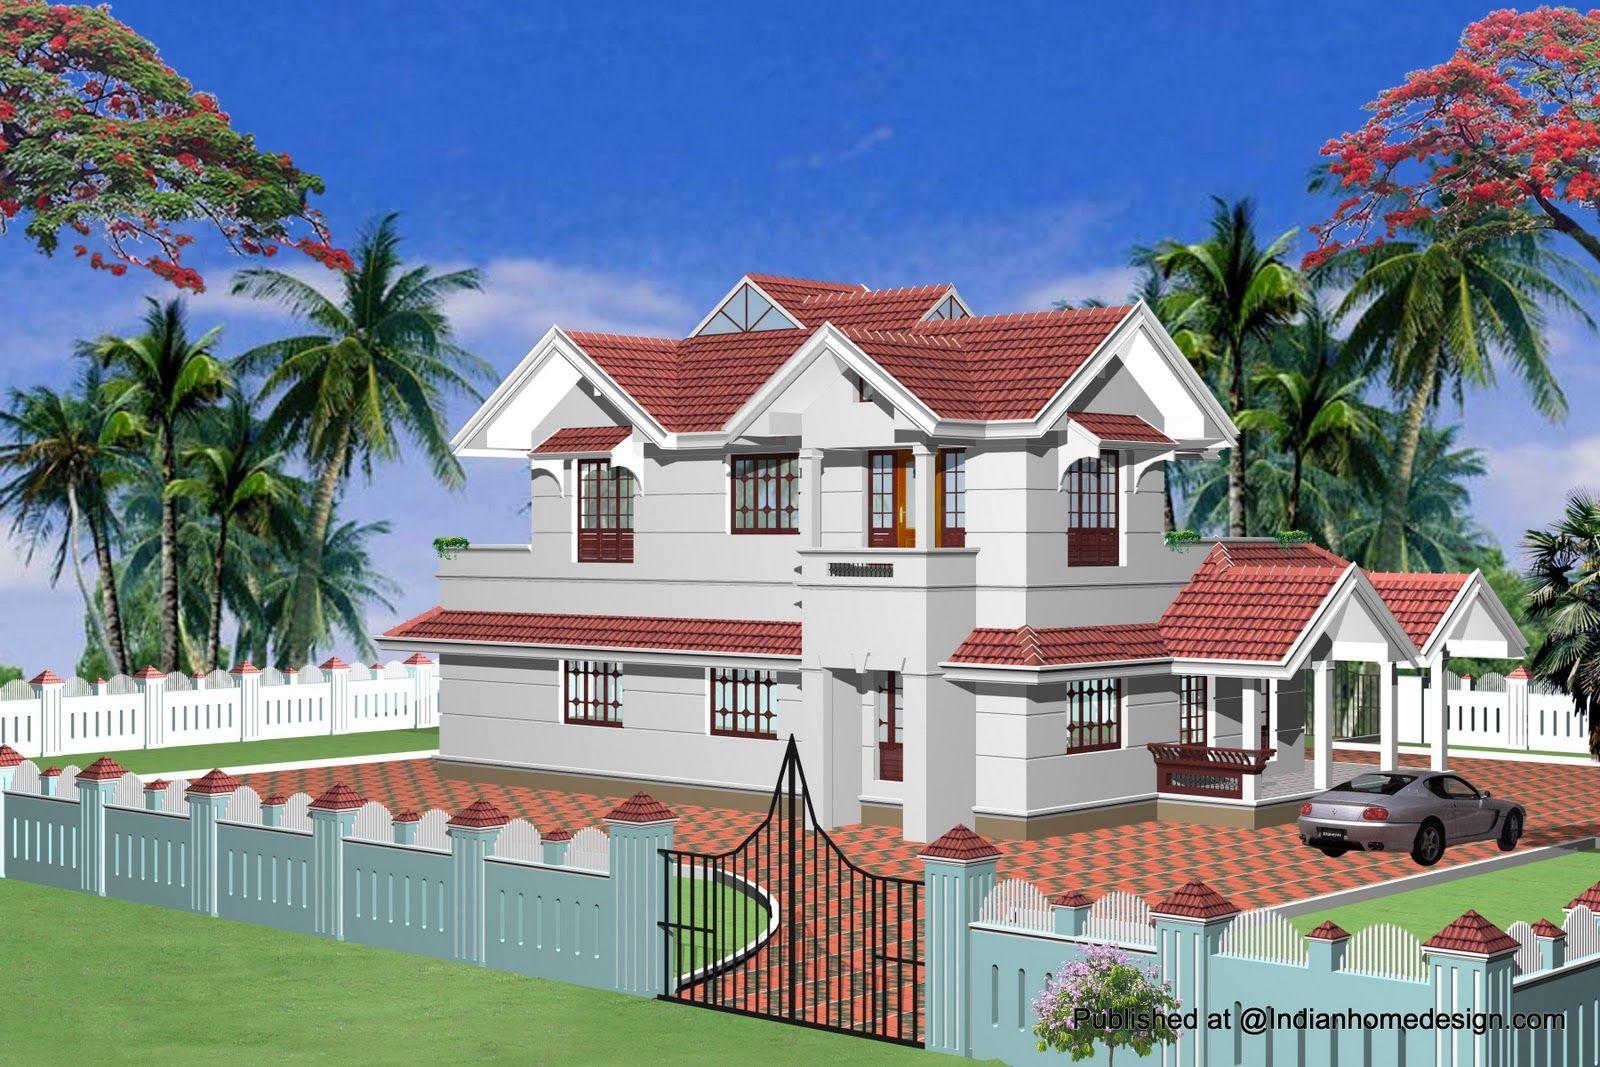 Exterior house plans - Interior And Exterior Home Plans